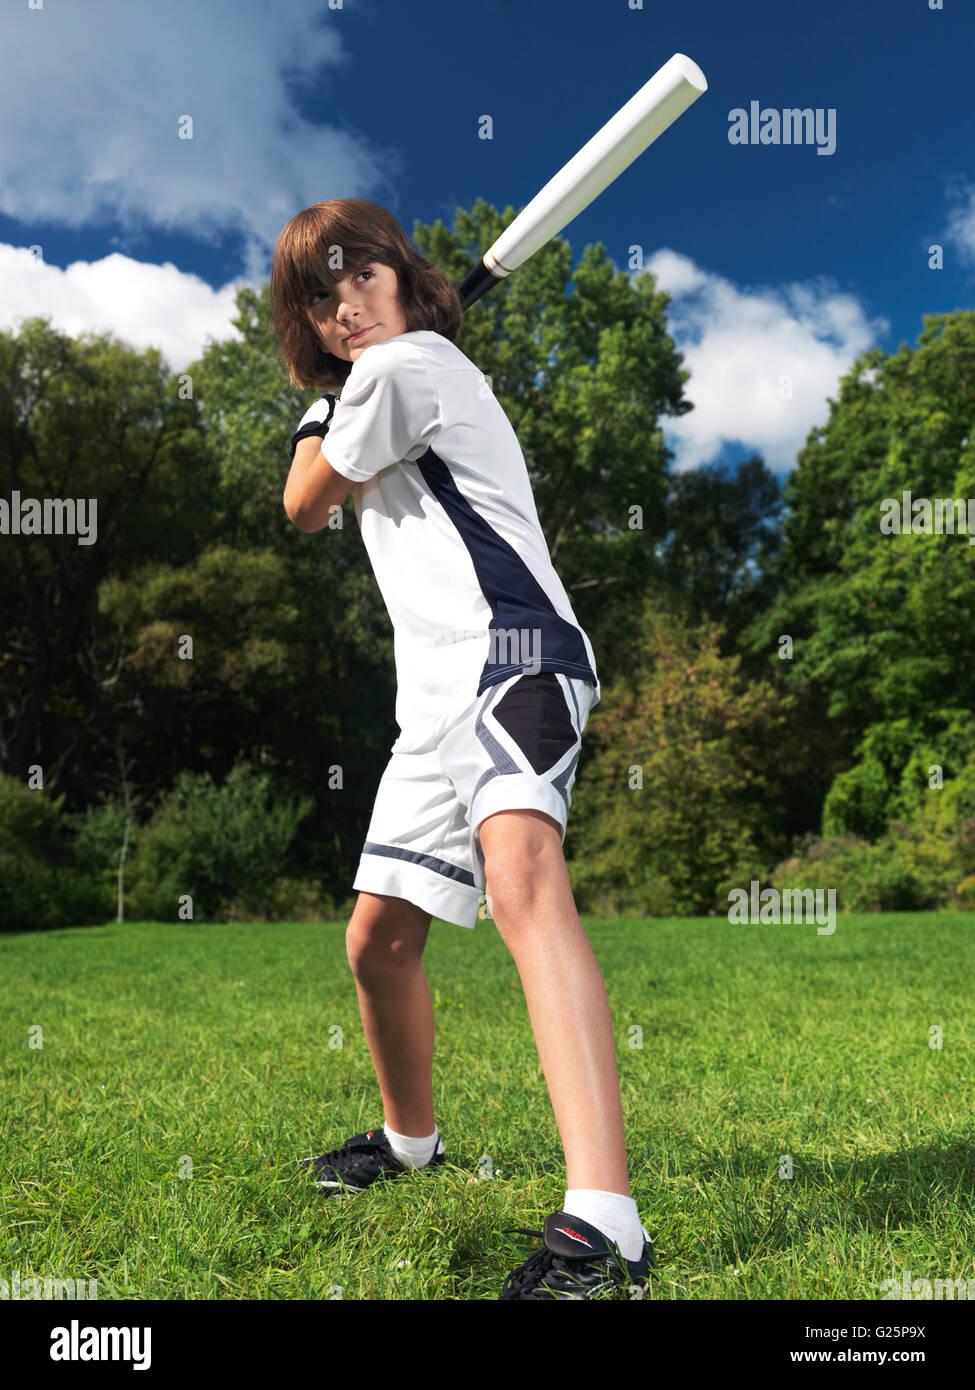 Boy posing with a baseball bat - Stock Image